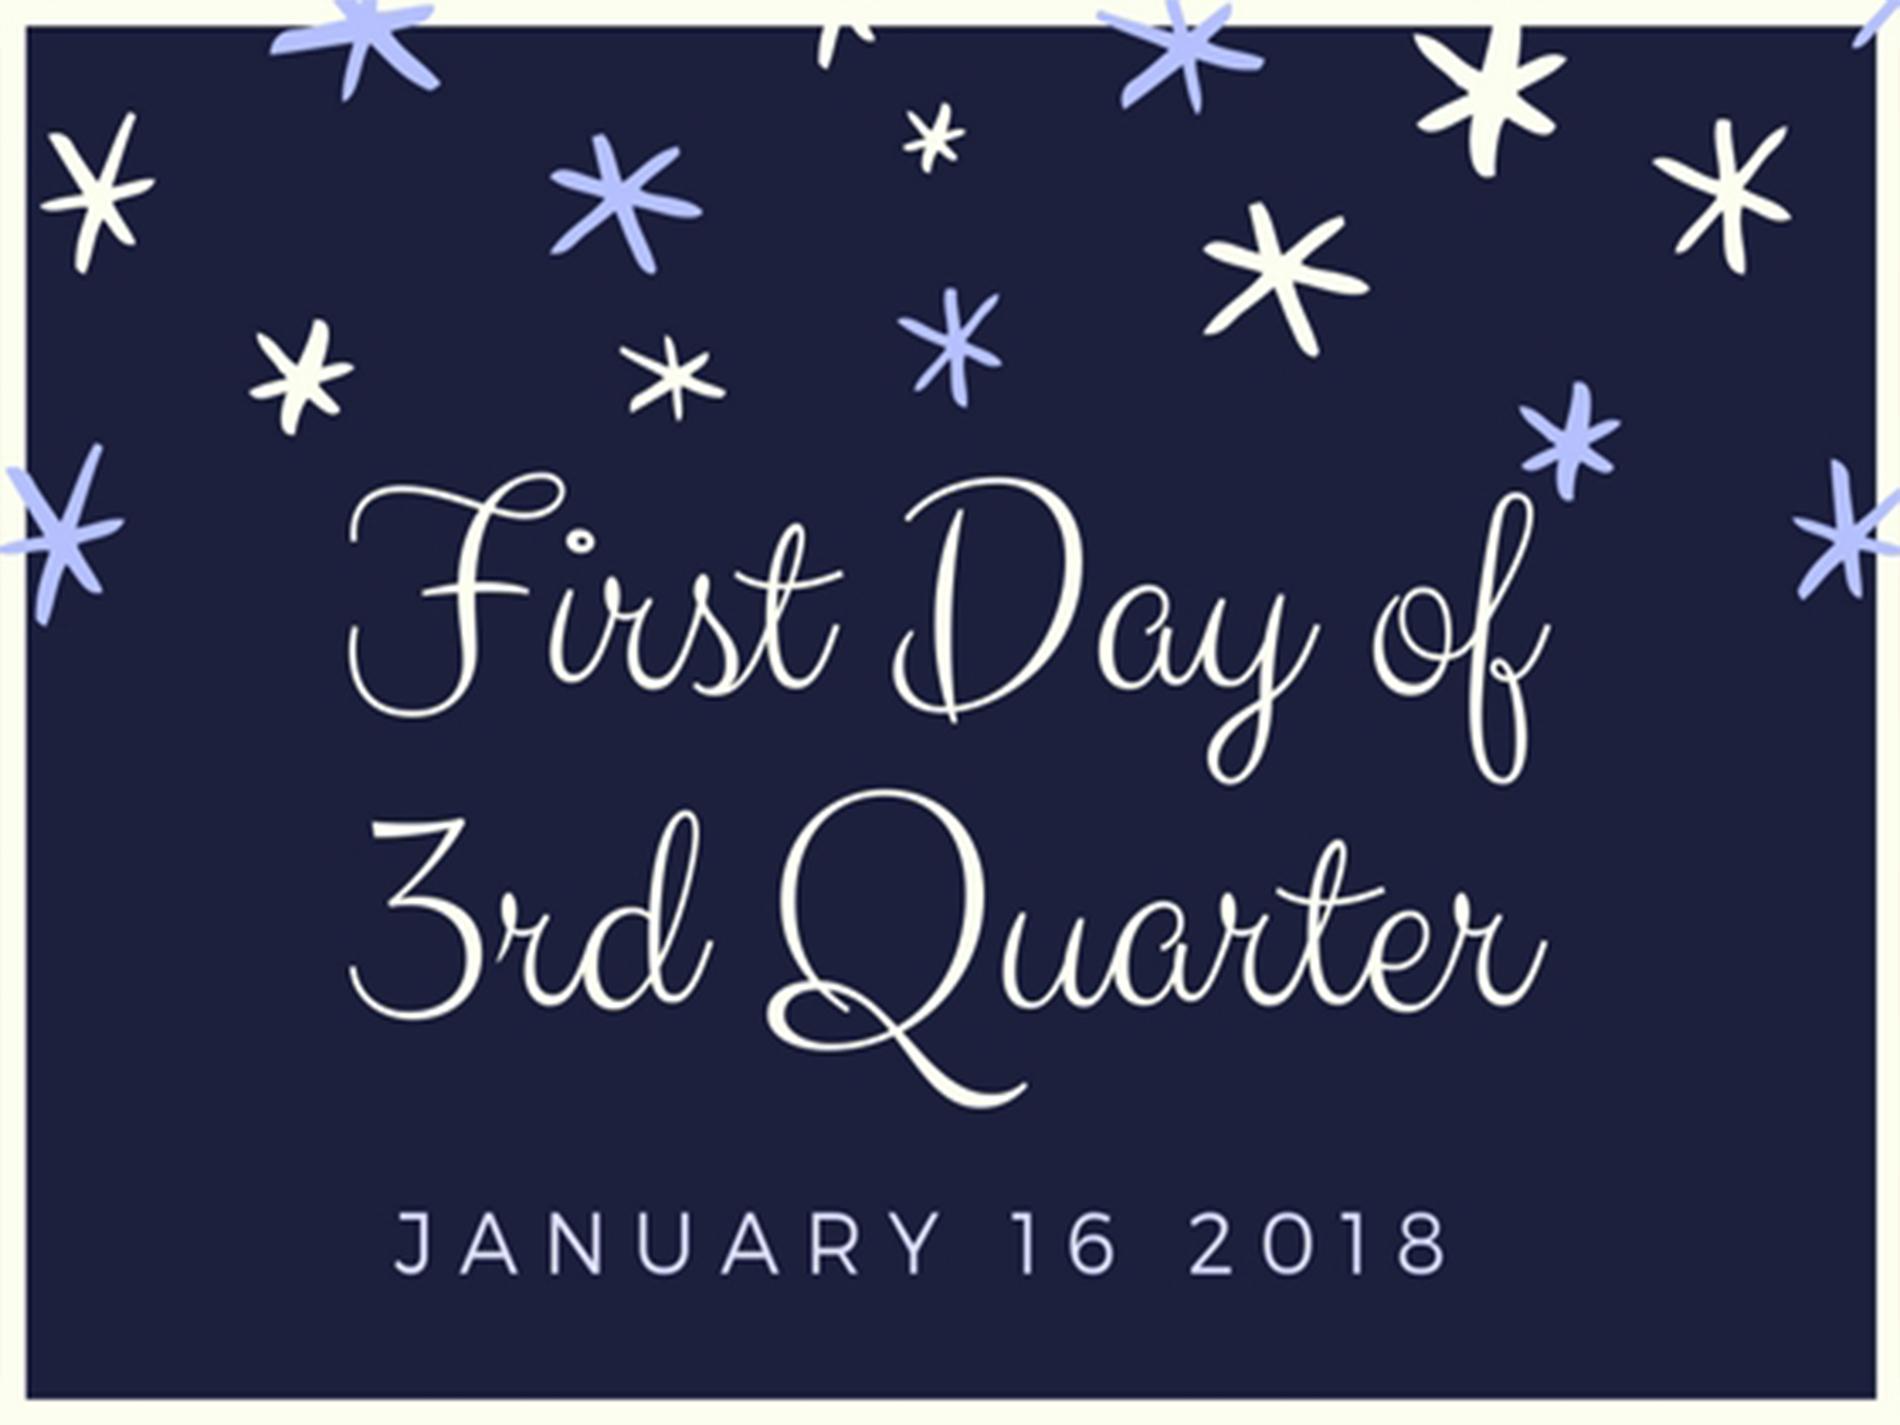 First-day-of-3rd-quarter.jpg